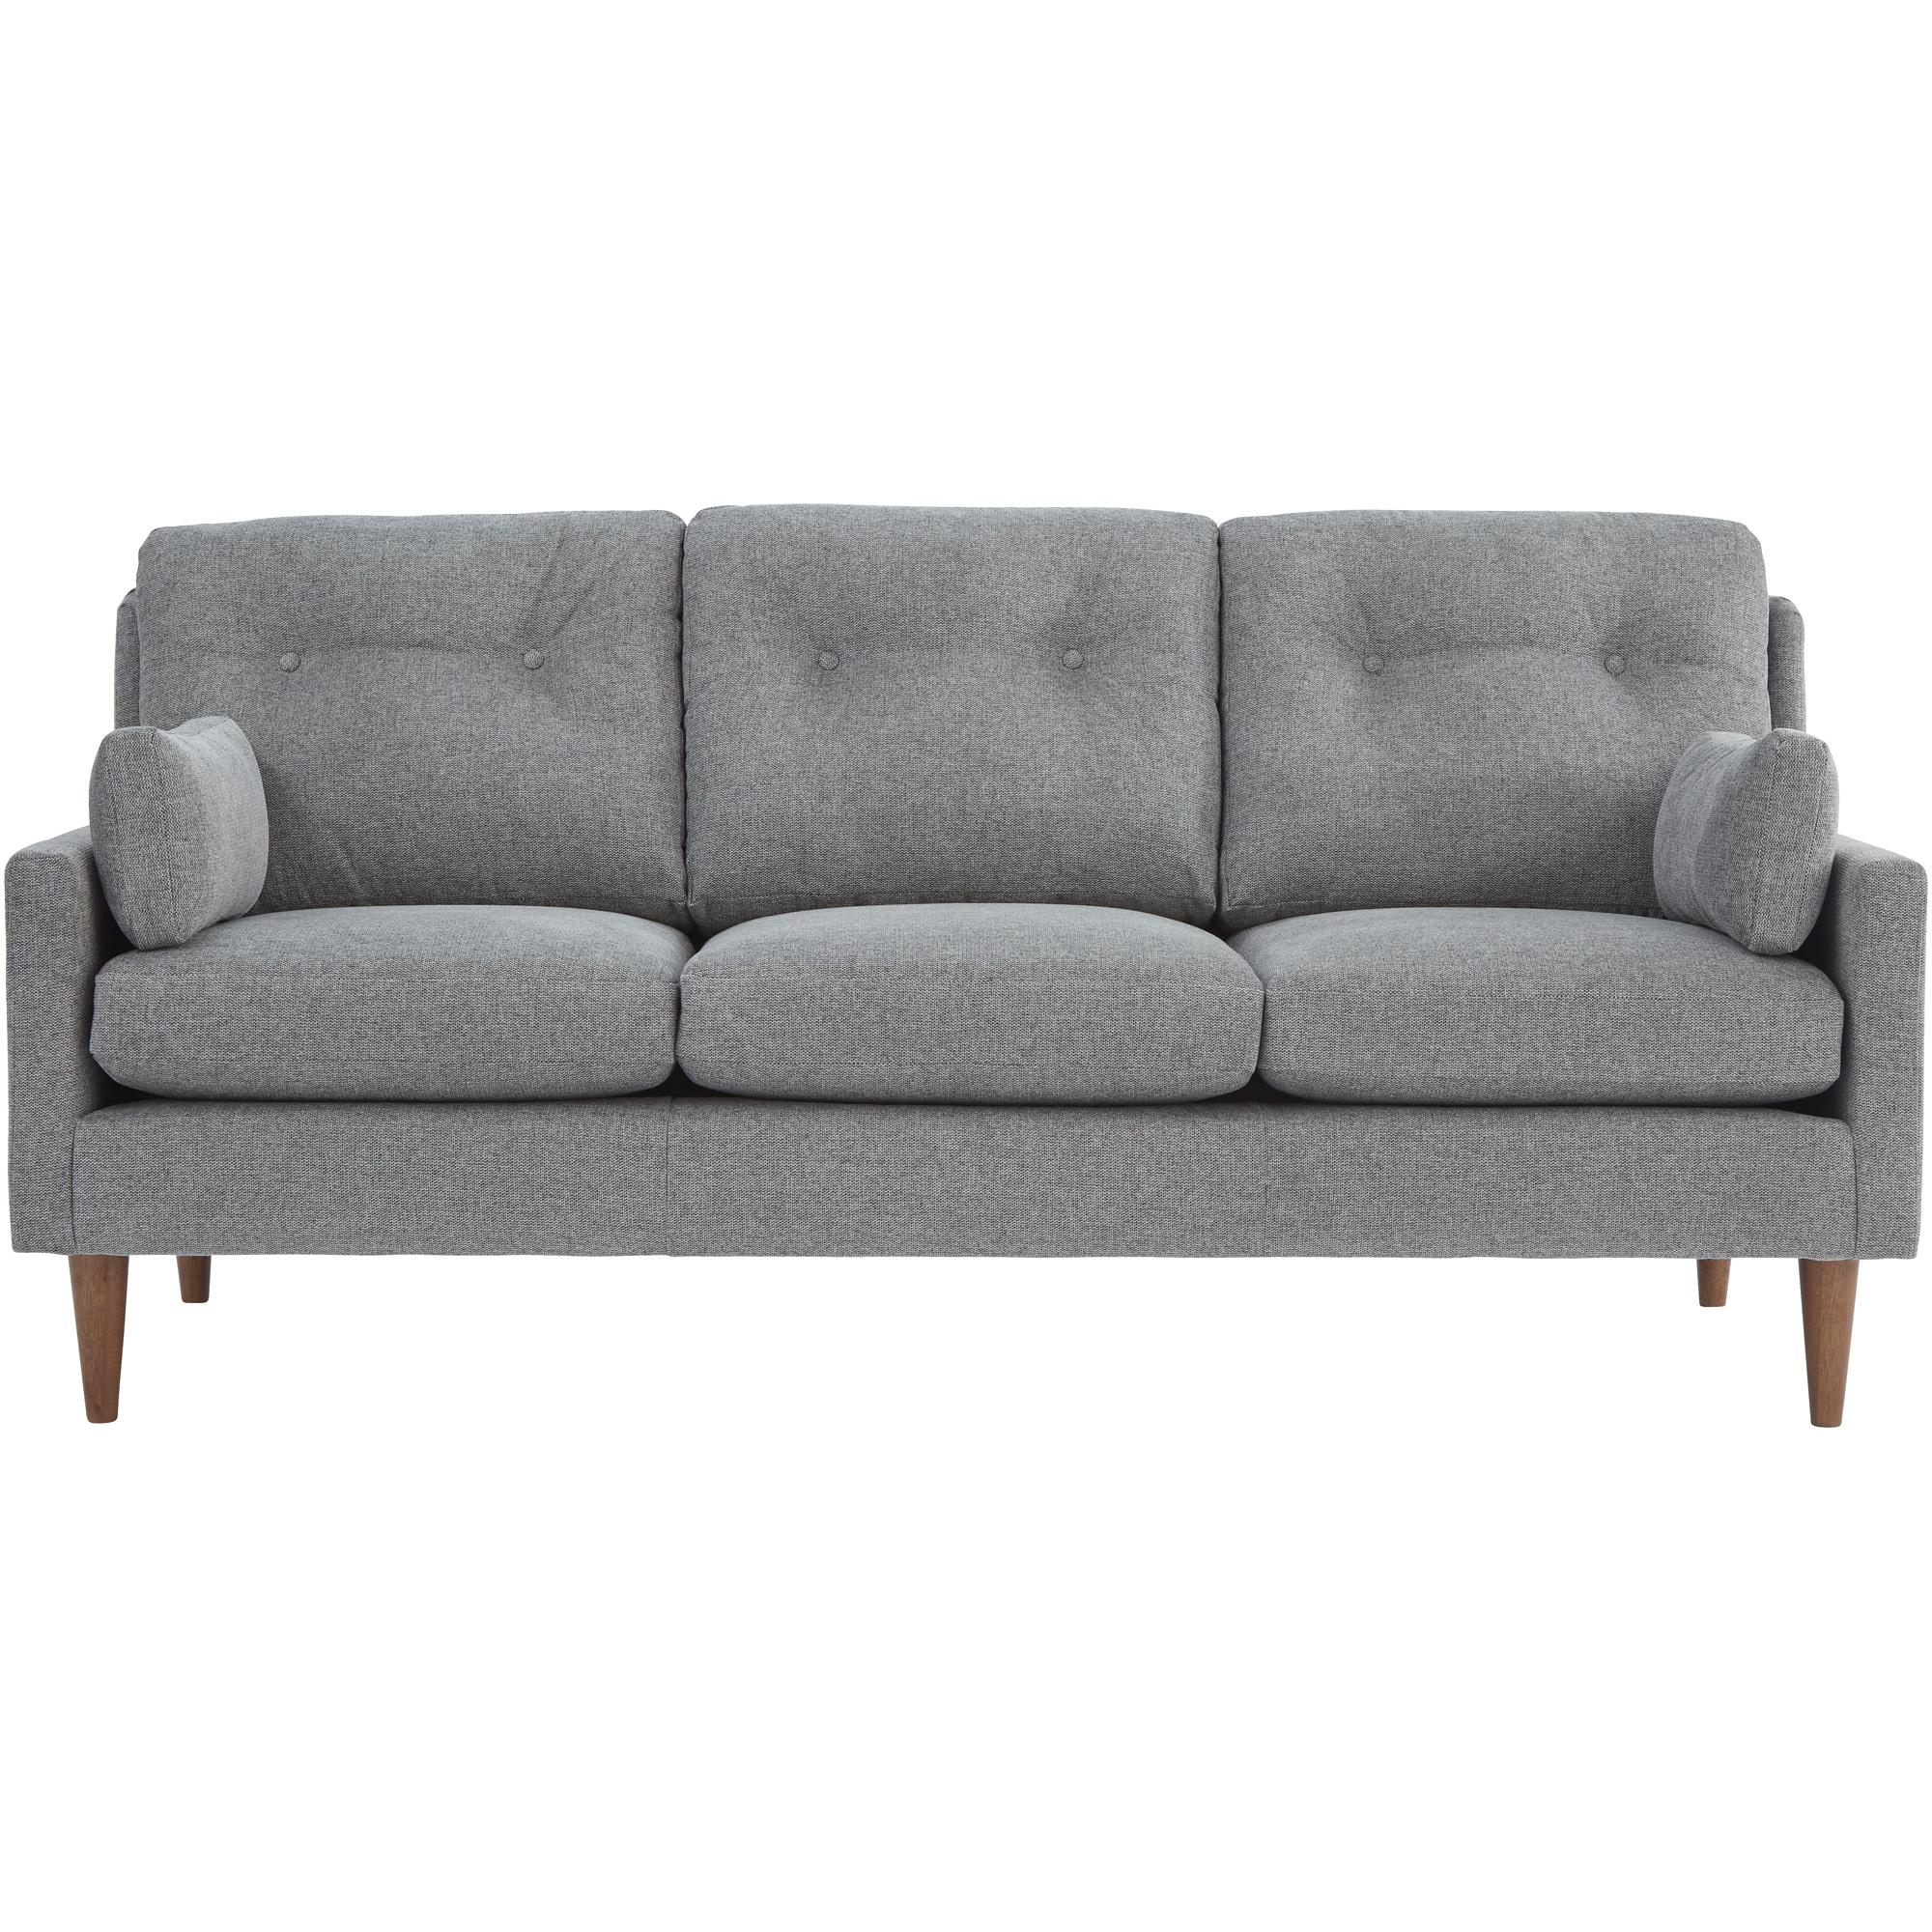 Best Home Furnishings | Trevin Ash Sofa